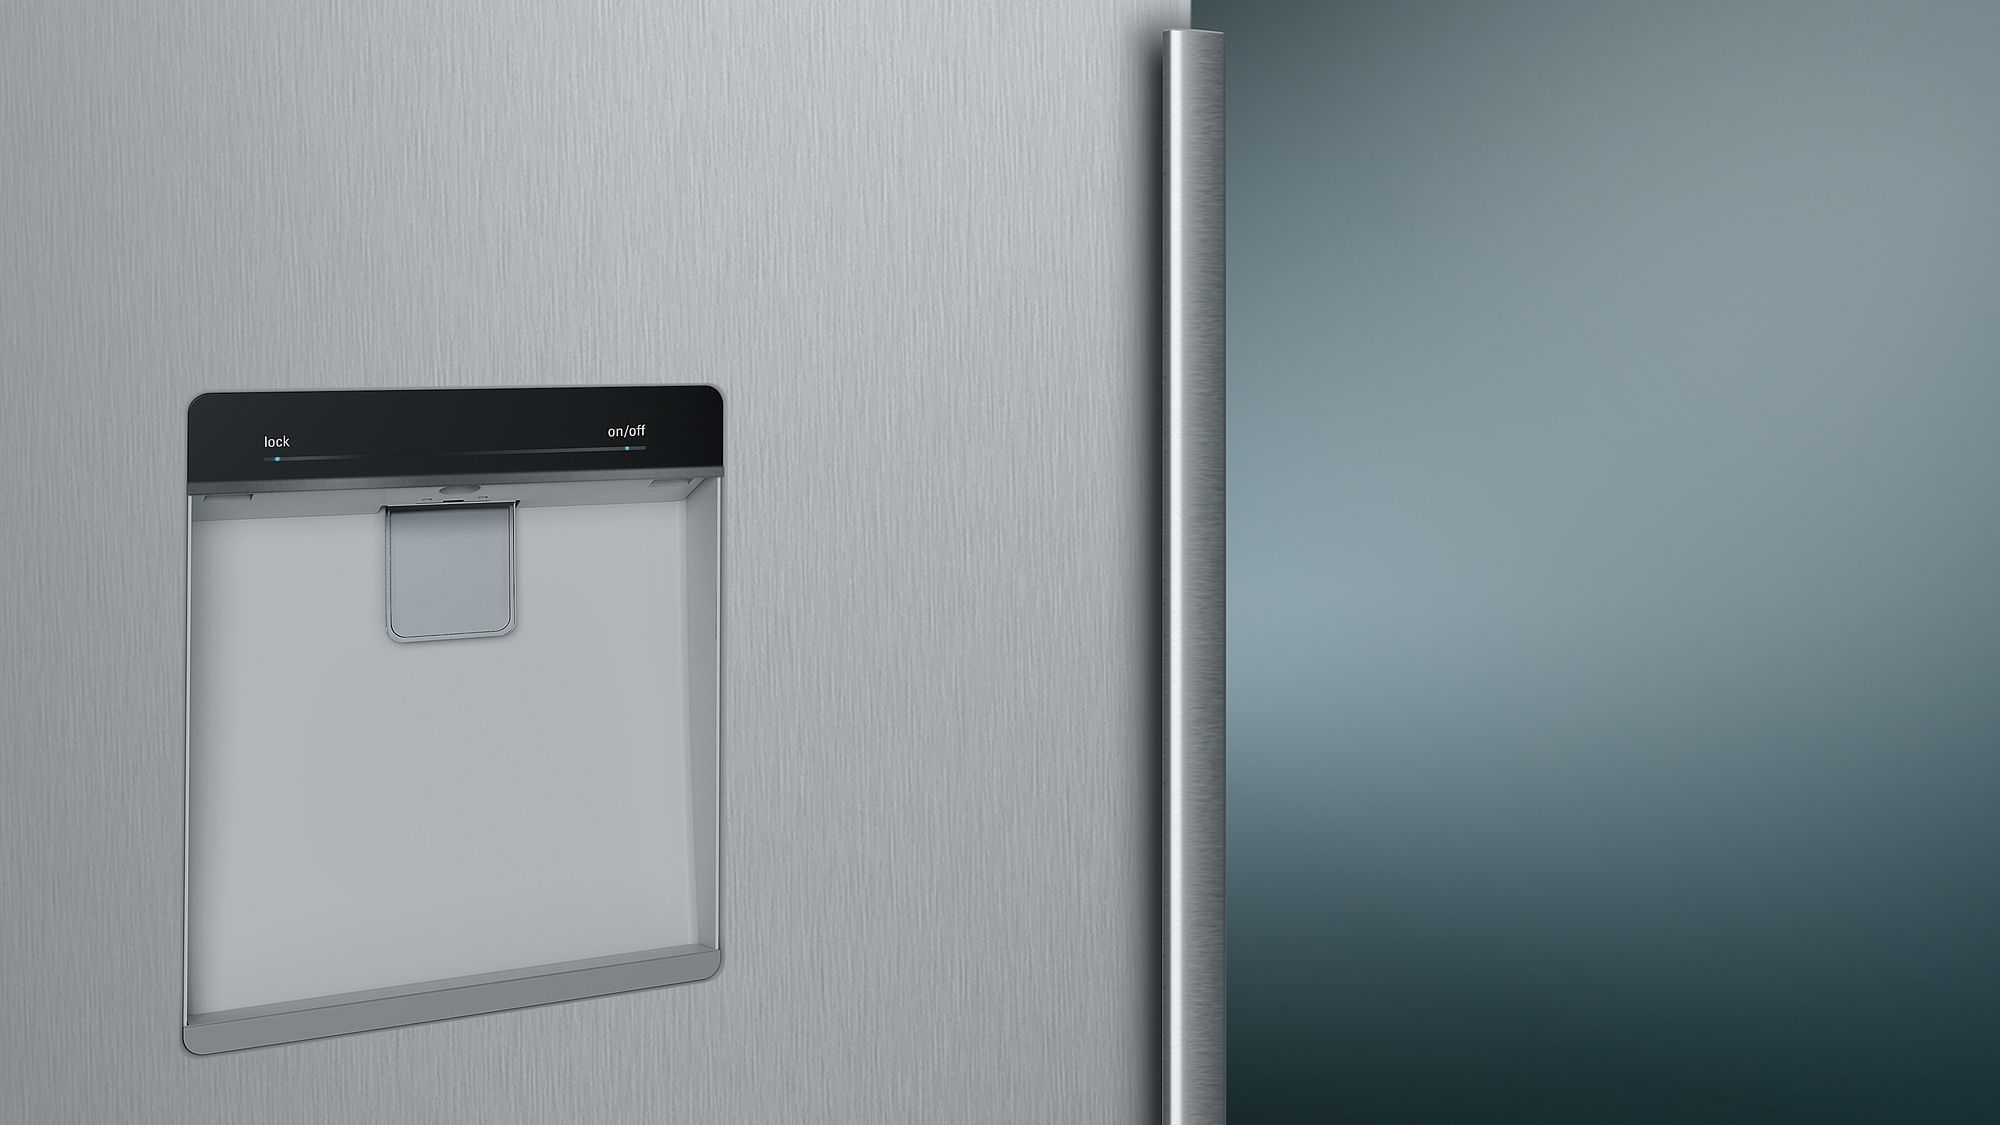 Siemens Kühlschrank Edelstahl : Siemens stand kühlschrank iq500 tür edelstahl antifingerprint